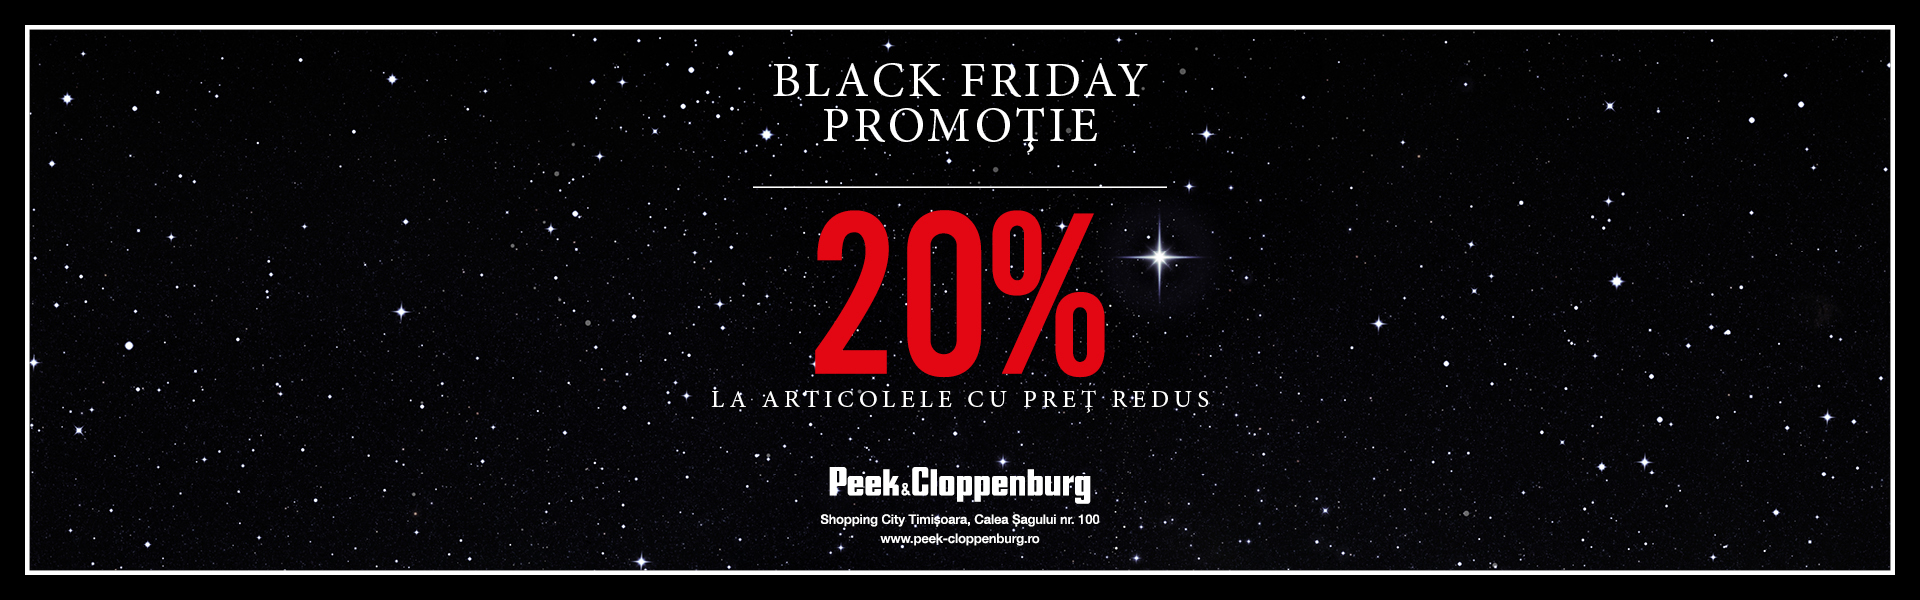 Peek & Cloppenburg Black Friday